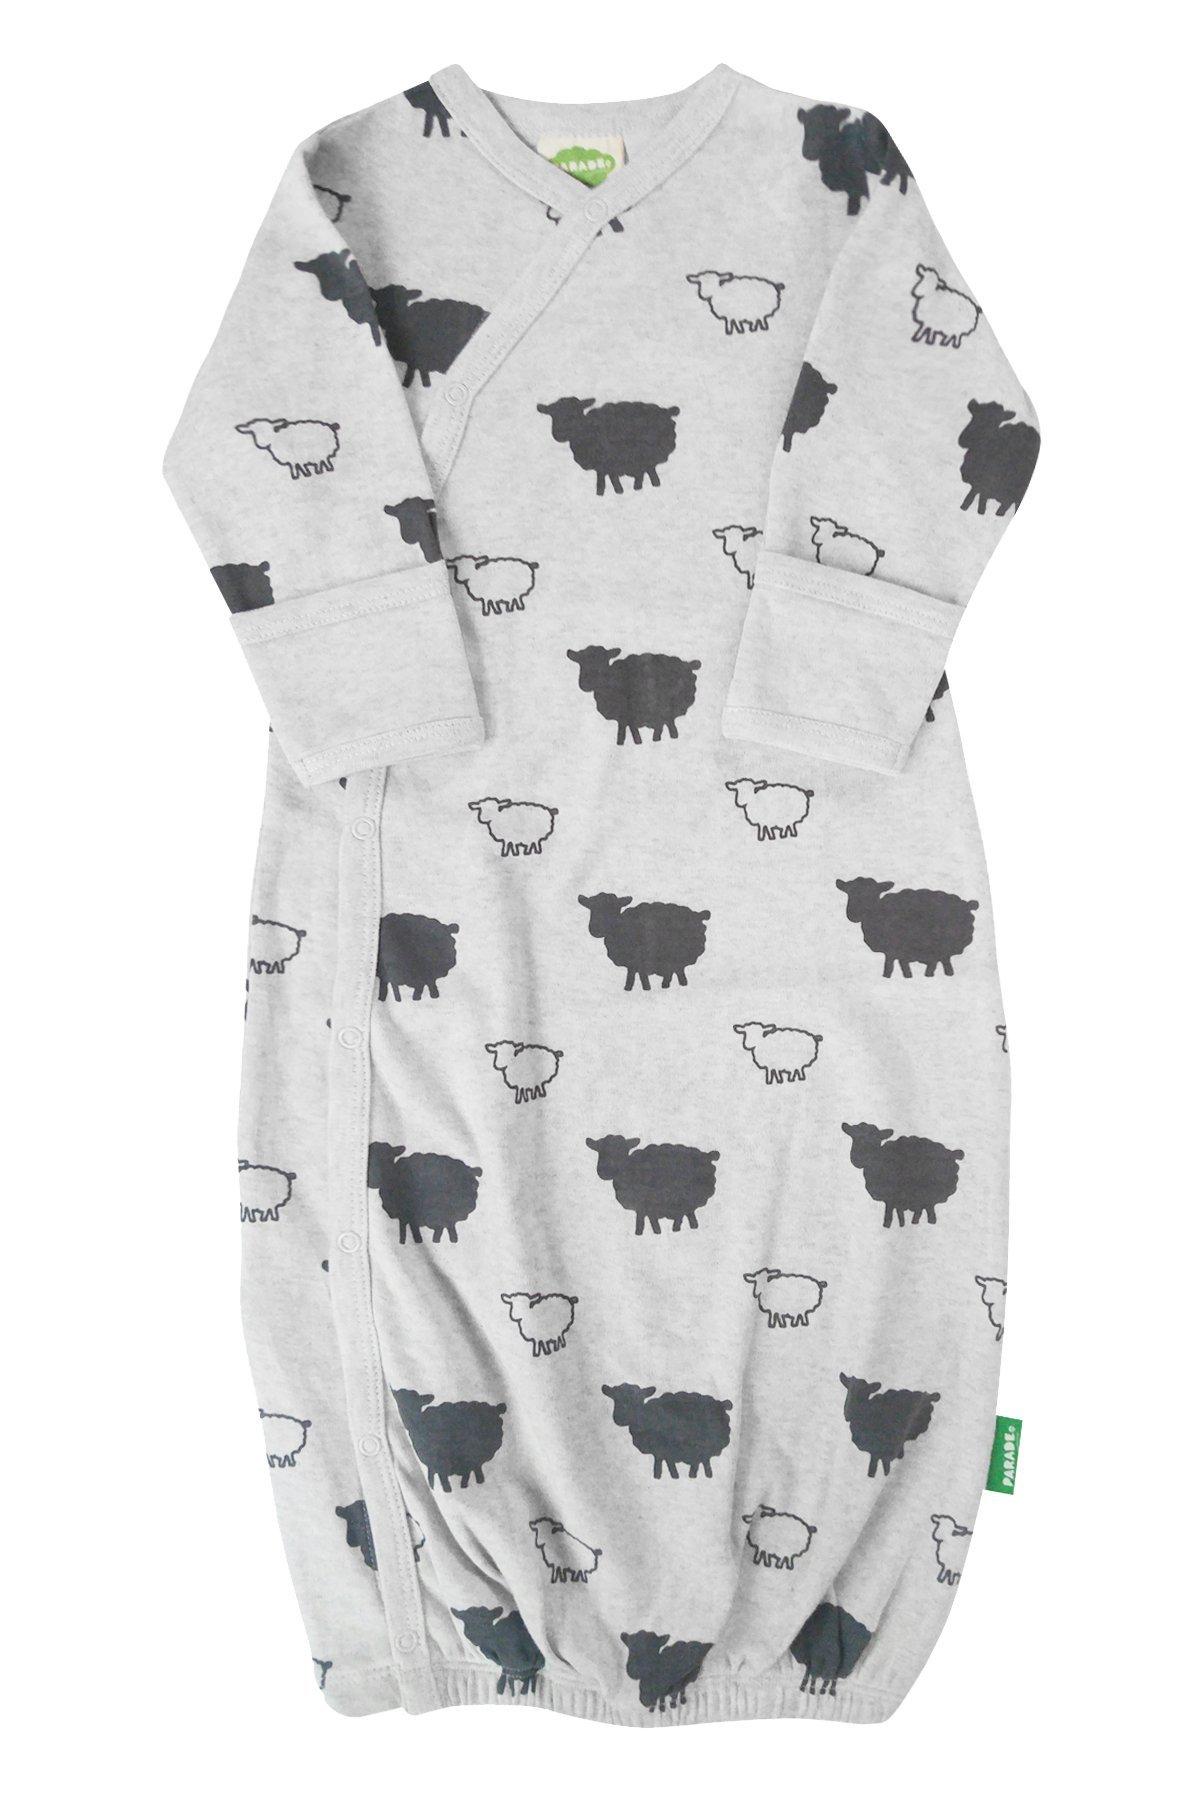 Parade Organics Kimono Gowns - Signature Prints Grey Sheep 3-6 Months